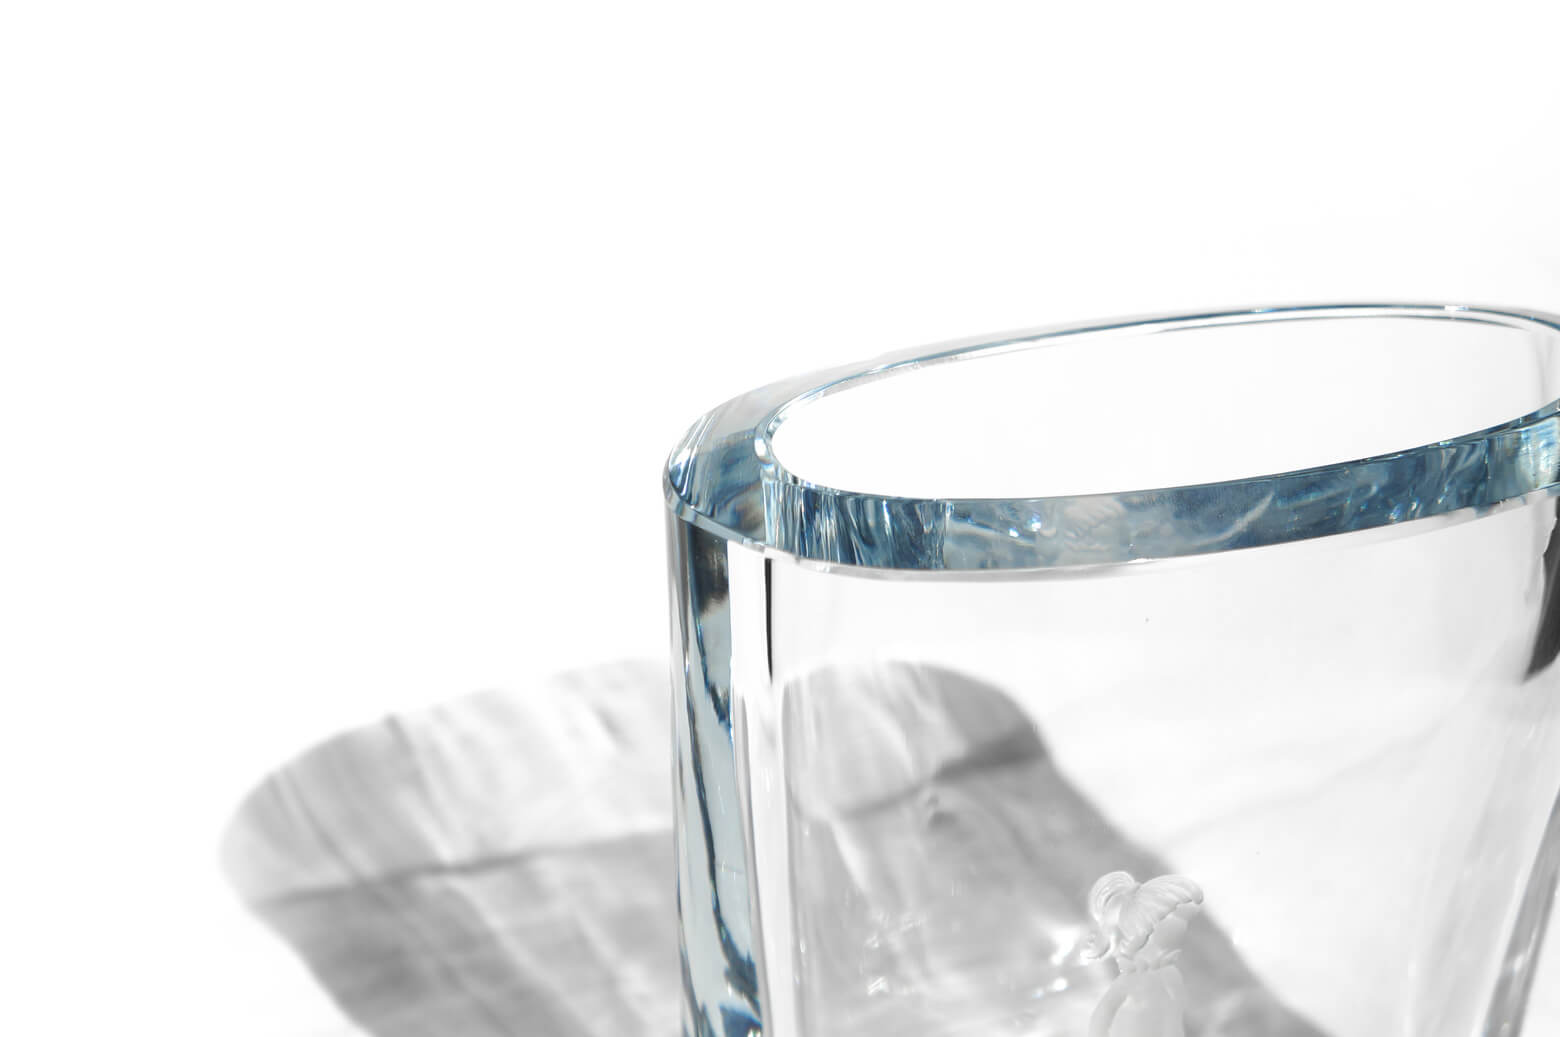 Strömbergshyttan Crystal Glass Vase Little Girl/スウェーデン ヴィンテージ クリスタルガラス ベース 小さな女の子 北欧雑貨